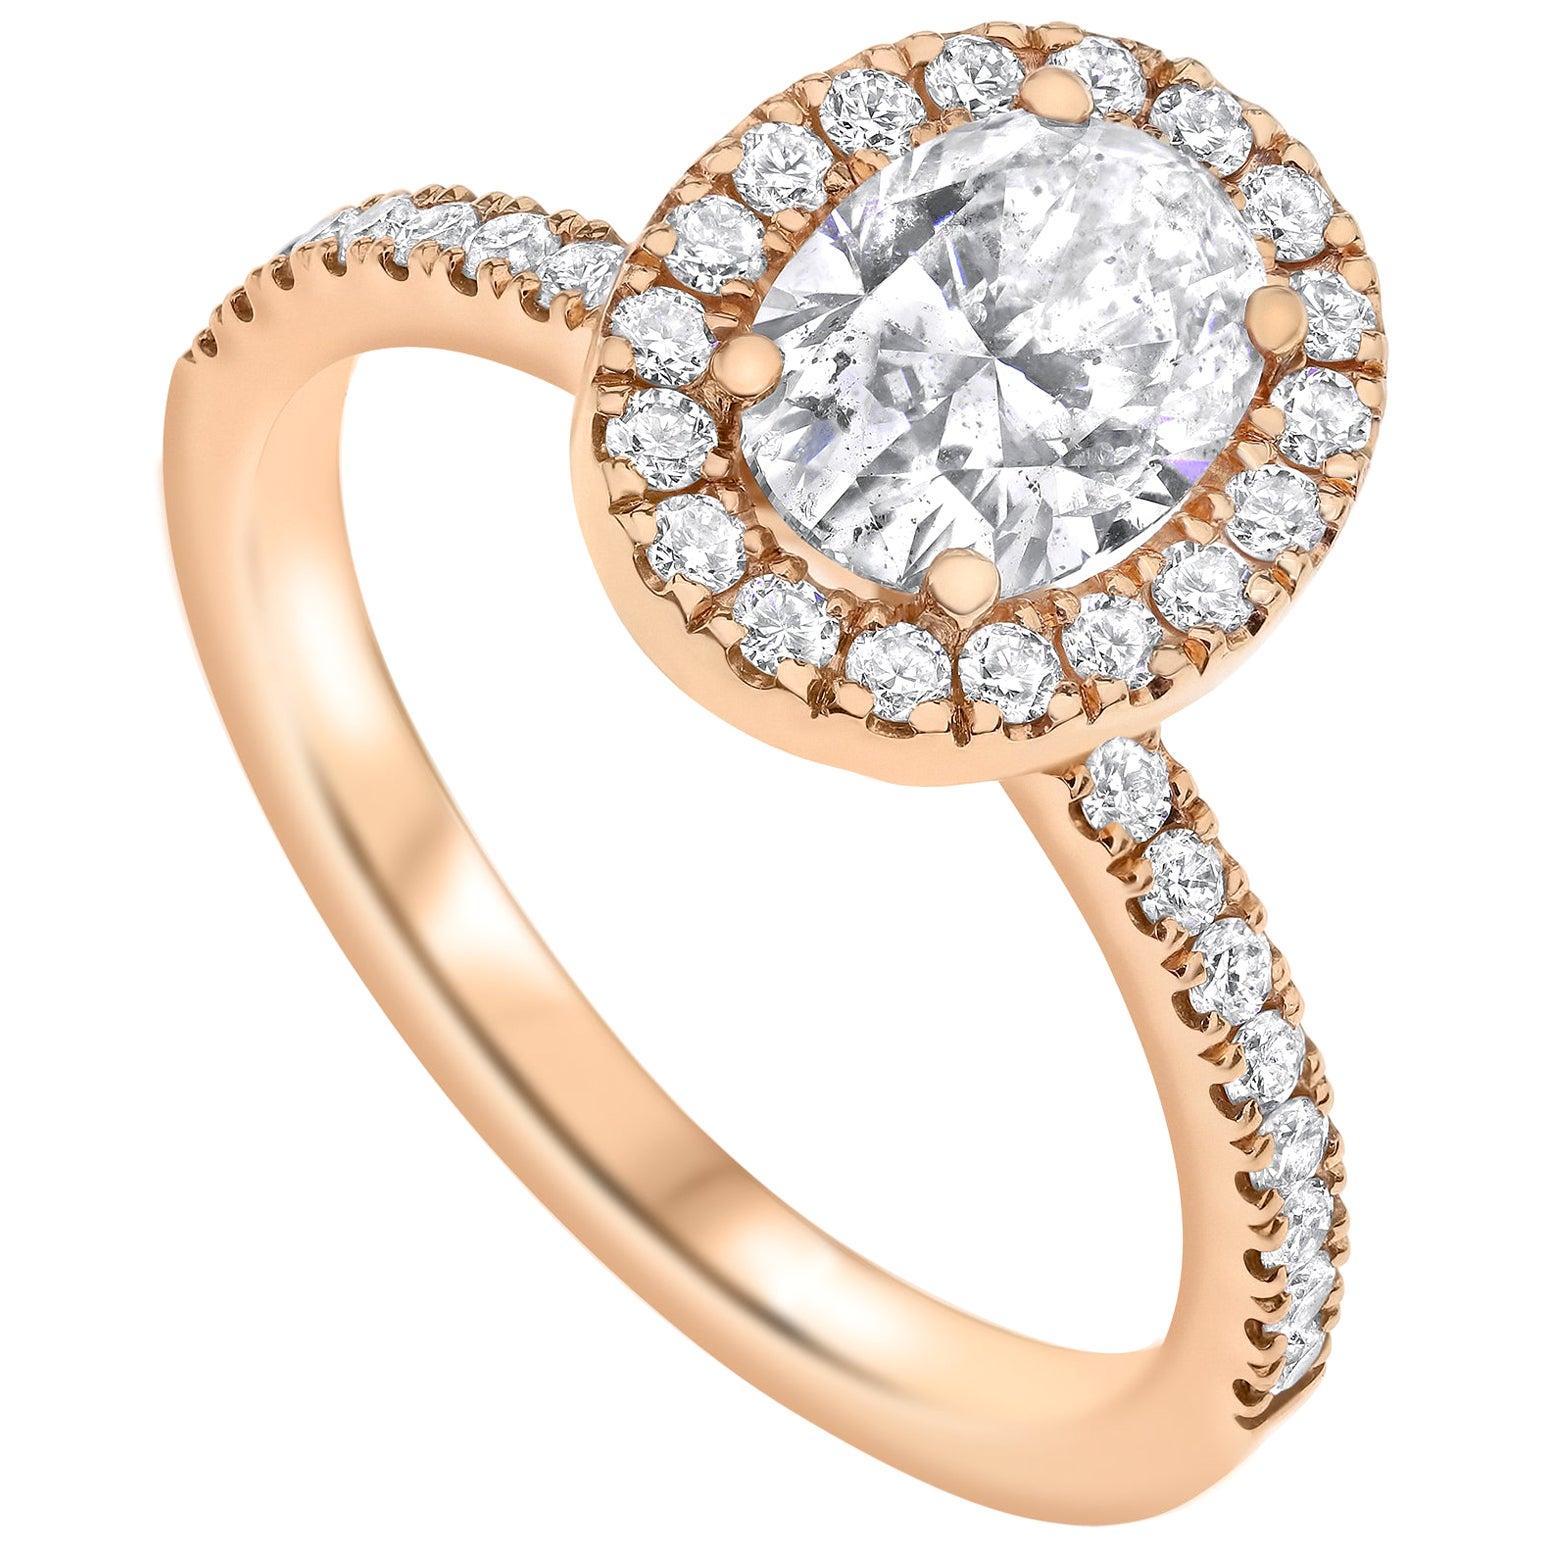 Shlomit Rogel, 1 Carat Oval Shaped Diamond Halo Ring in 14 Karat Rose Gold EGL